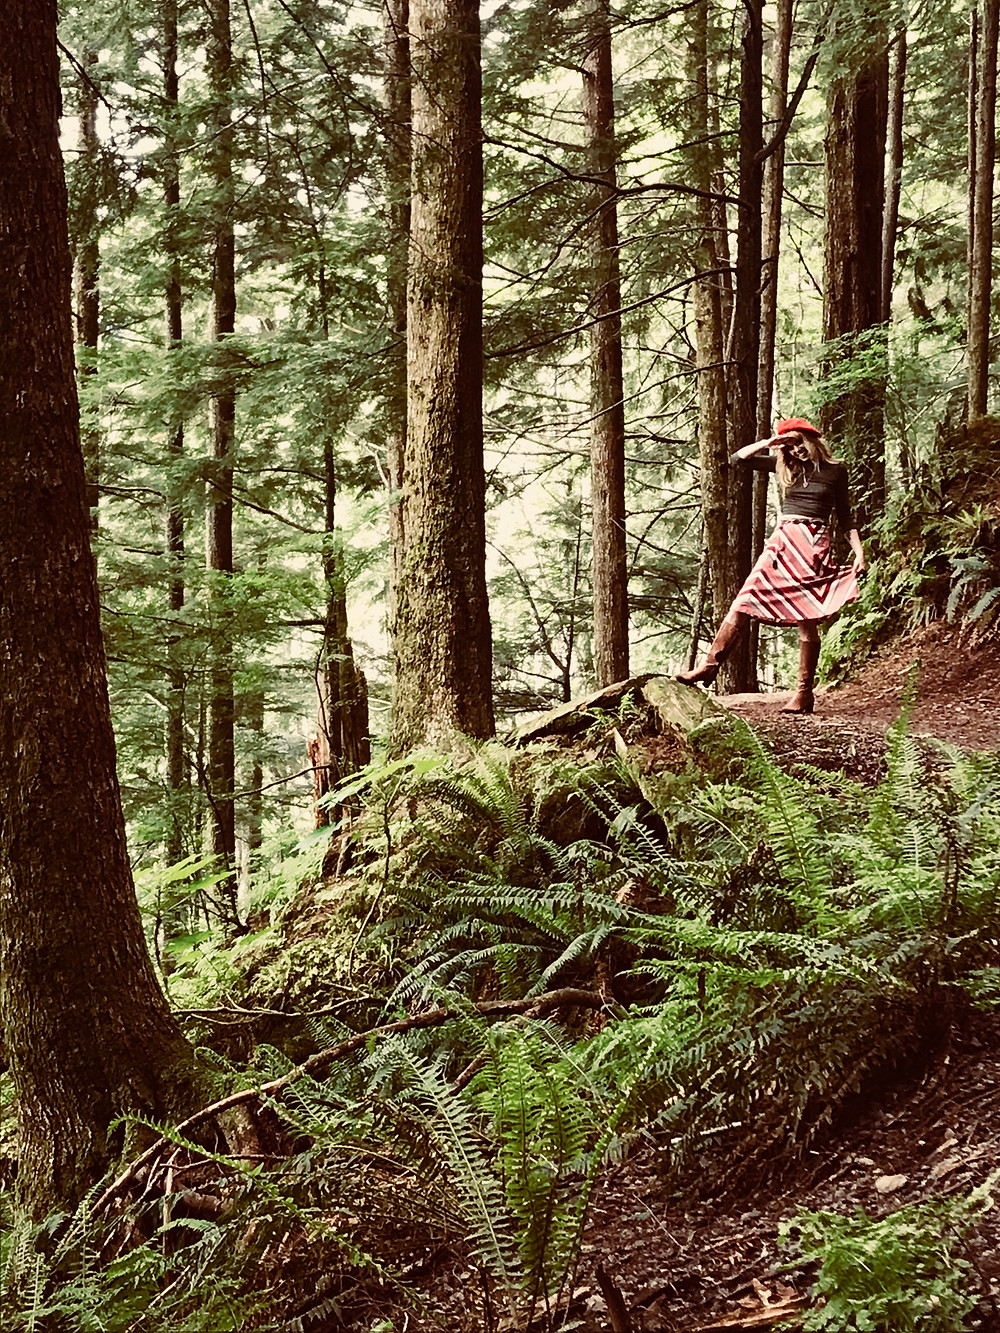 Devyn Crimson hiking in Ketchikan